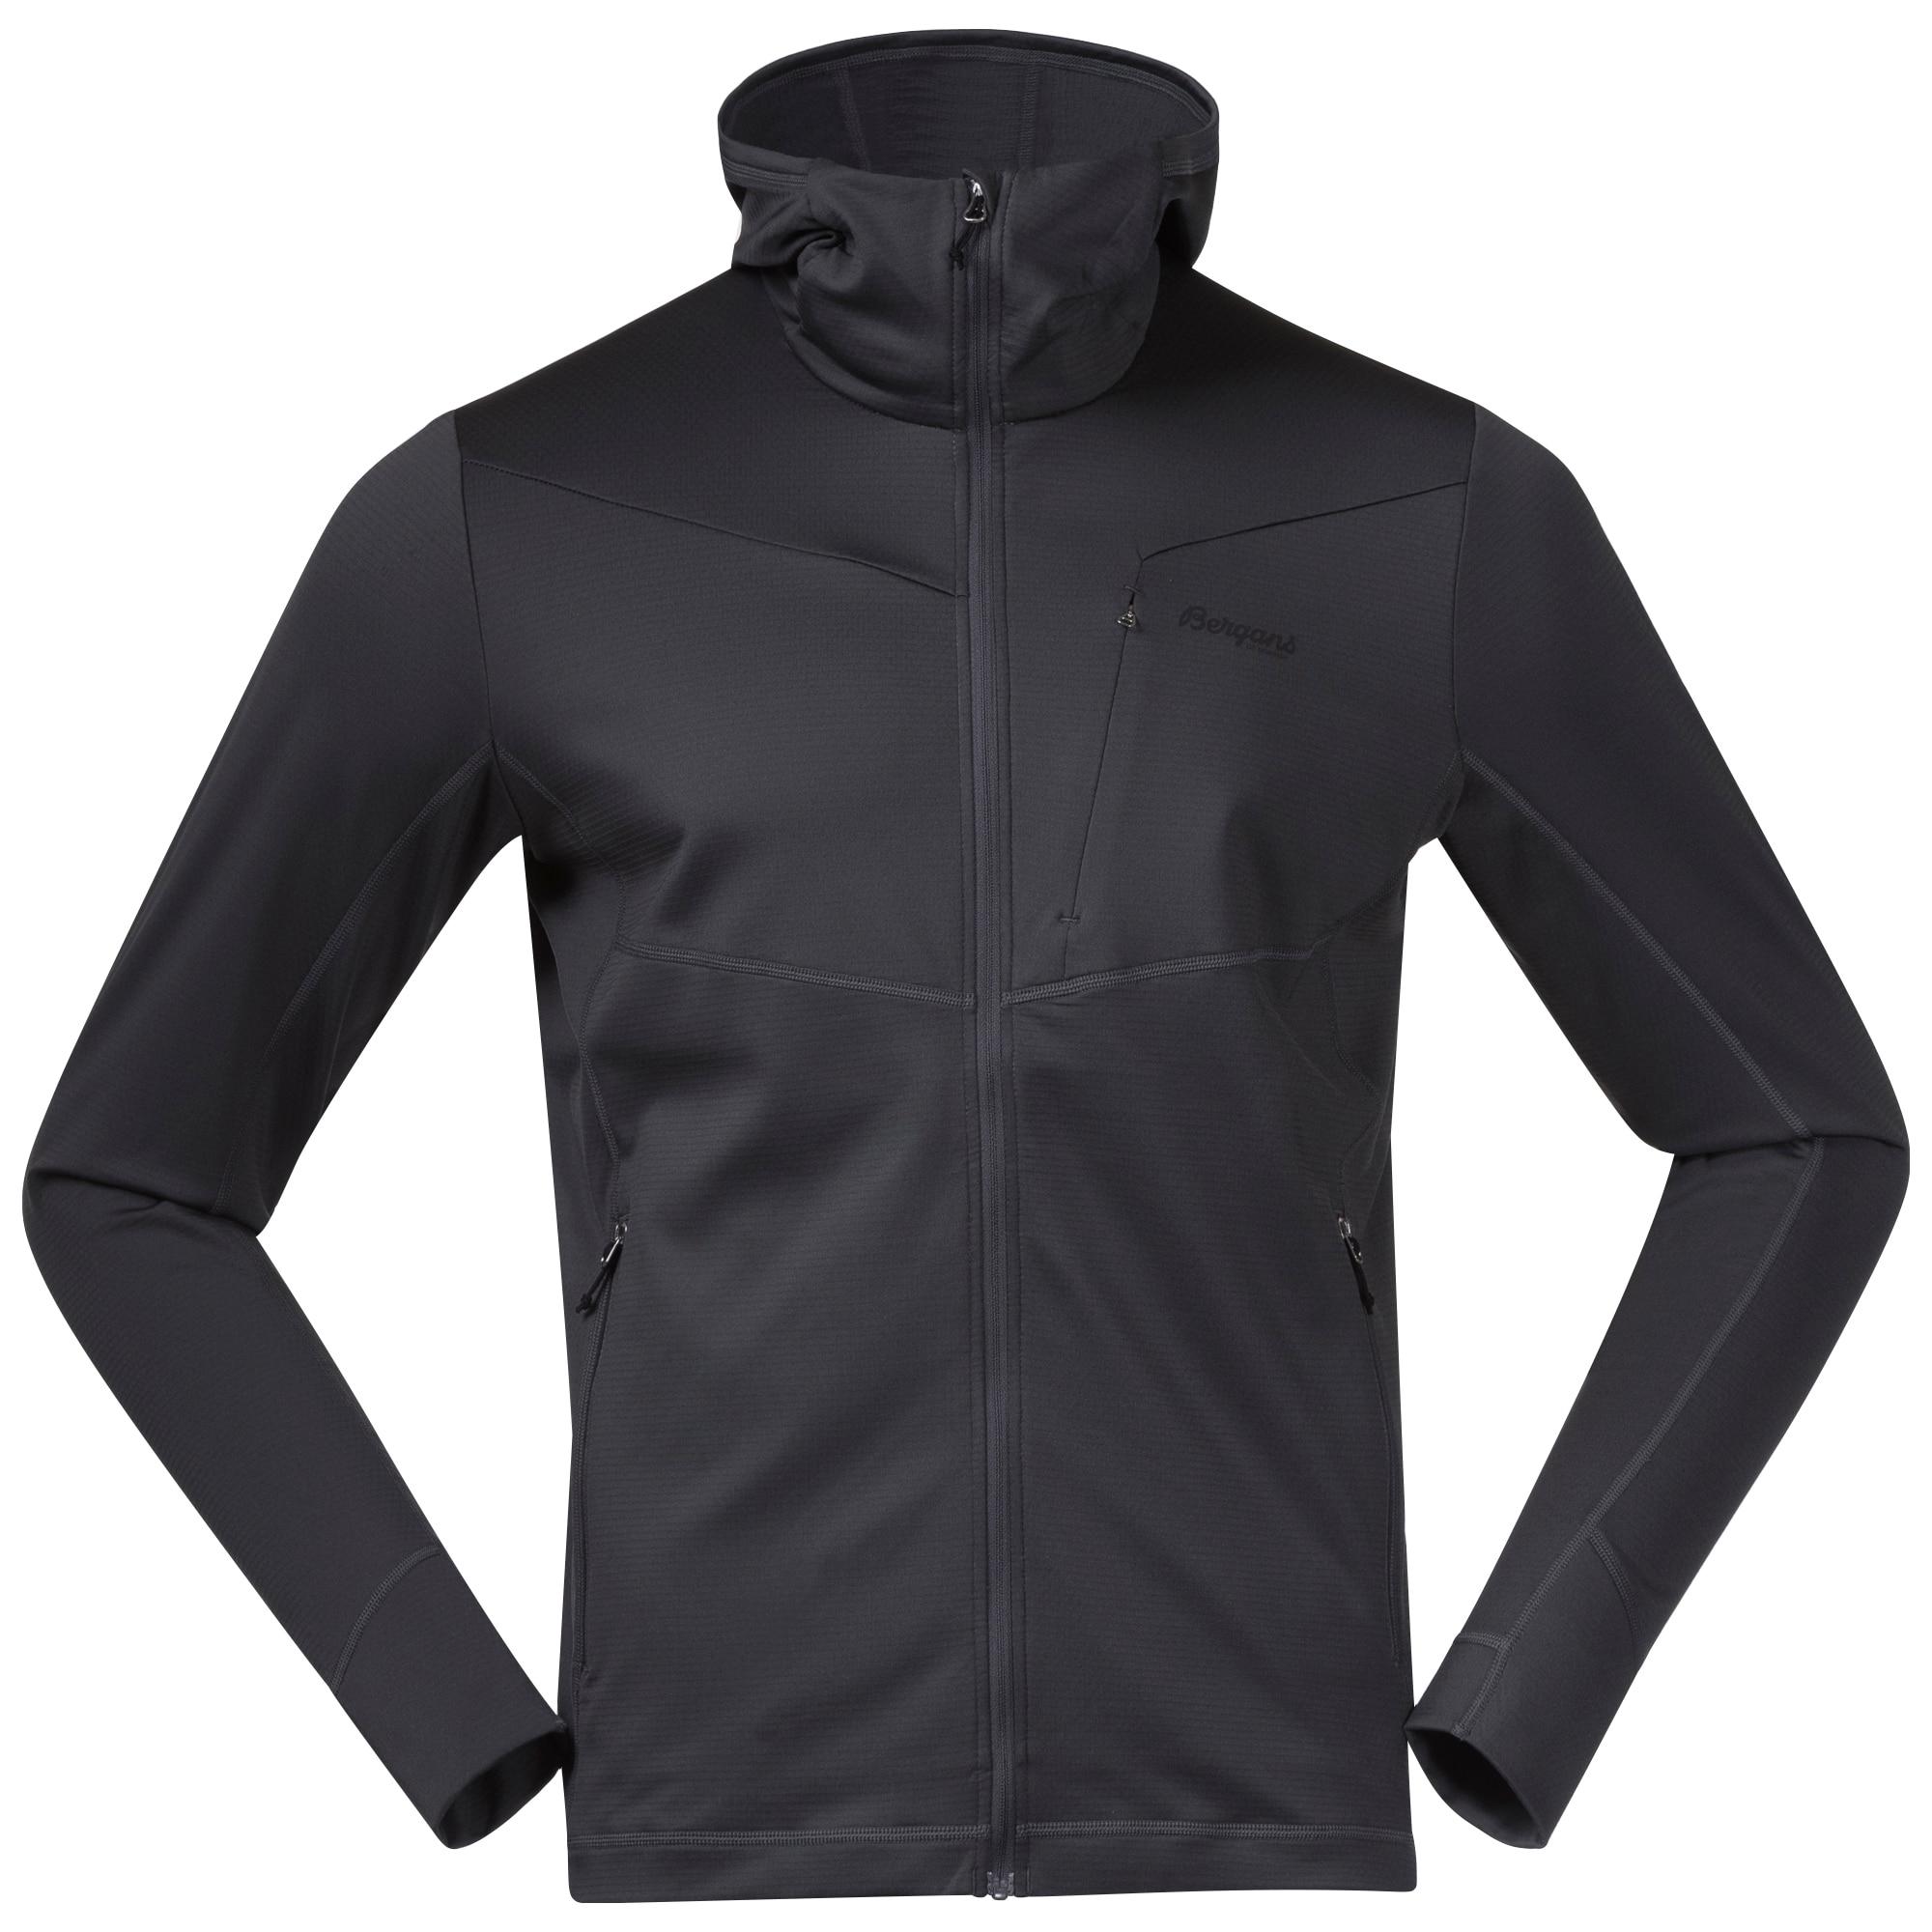 Skaland Hood Jacket